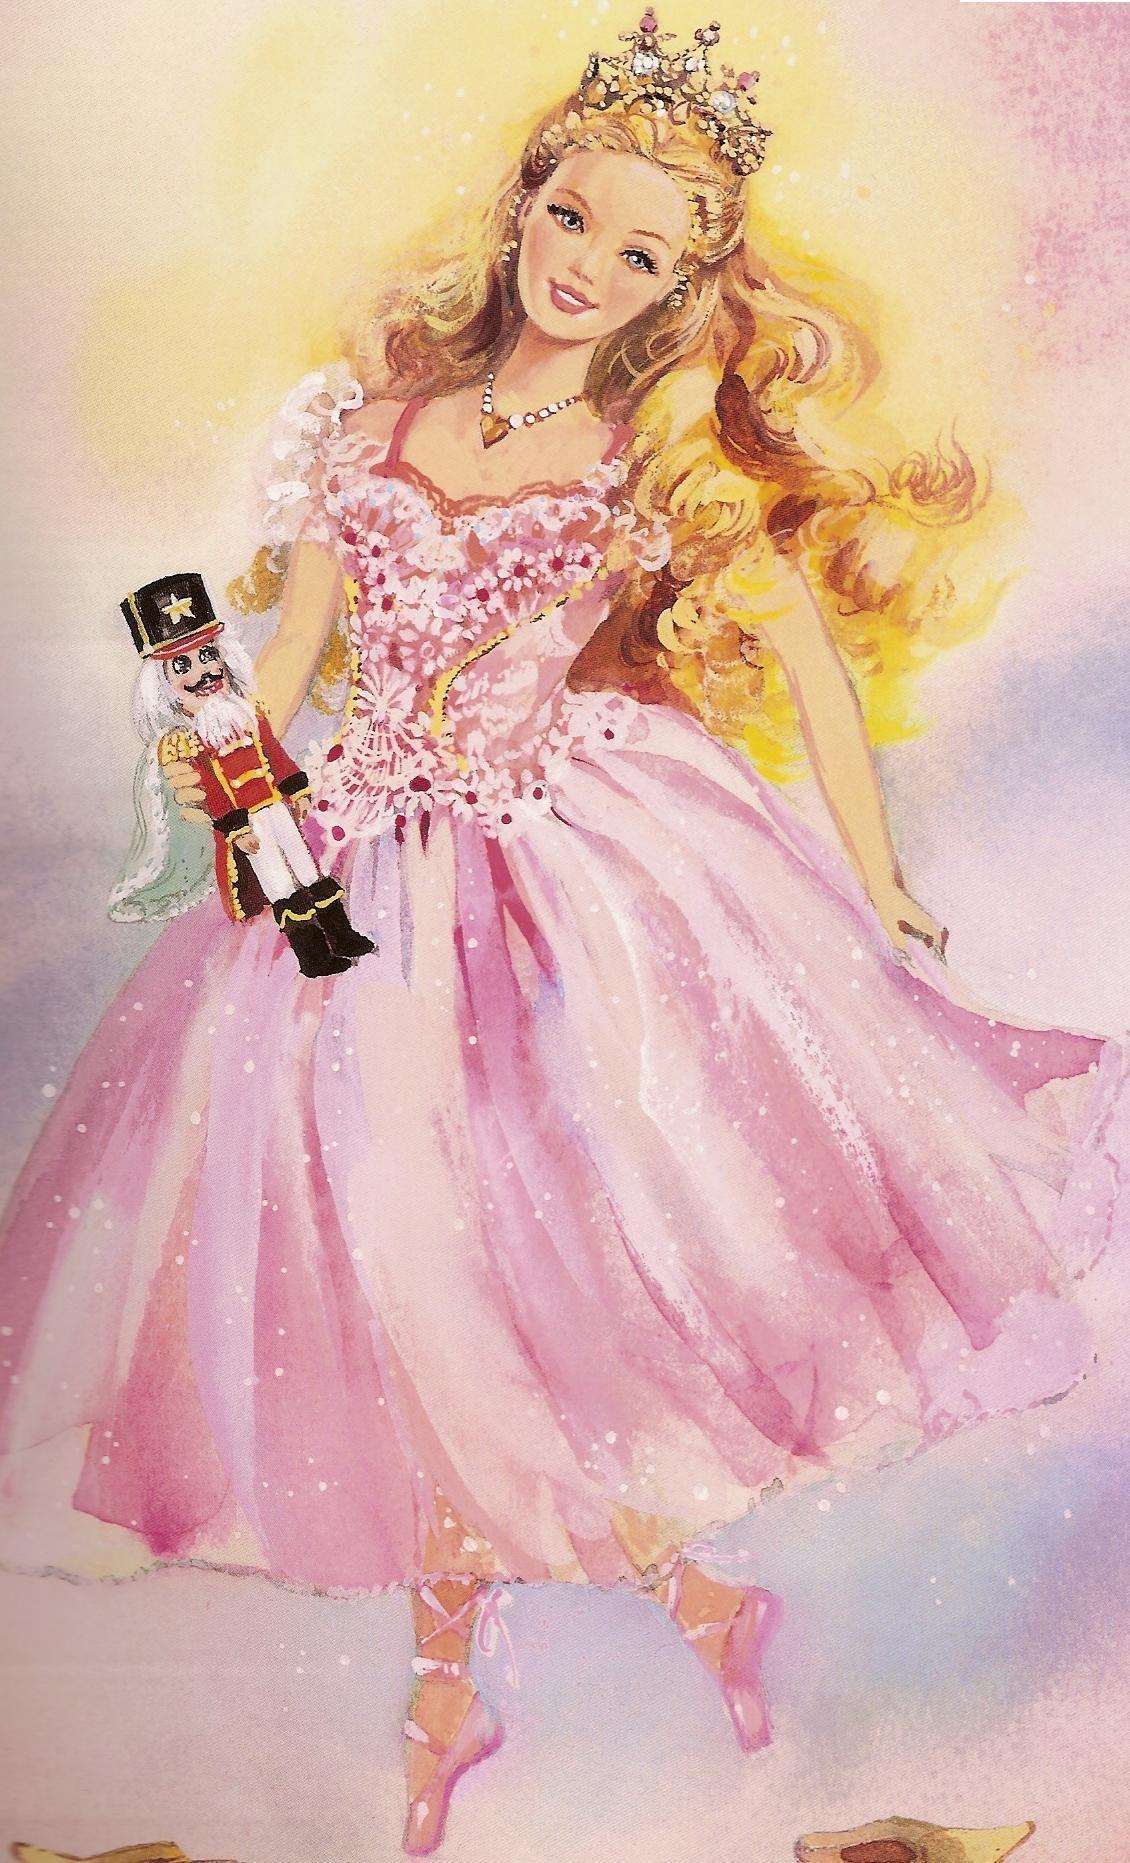 clara the sugar plum princess and the nutcrackeri